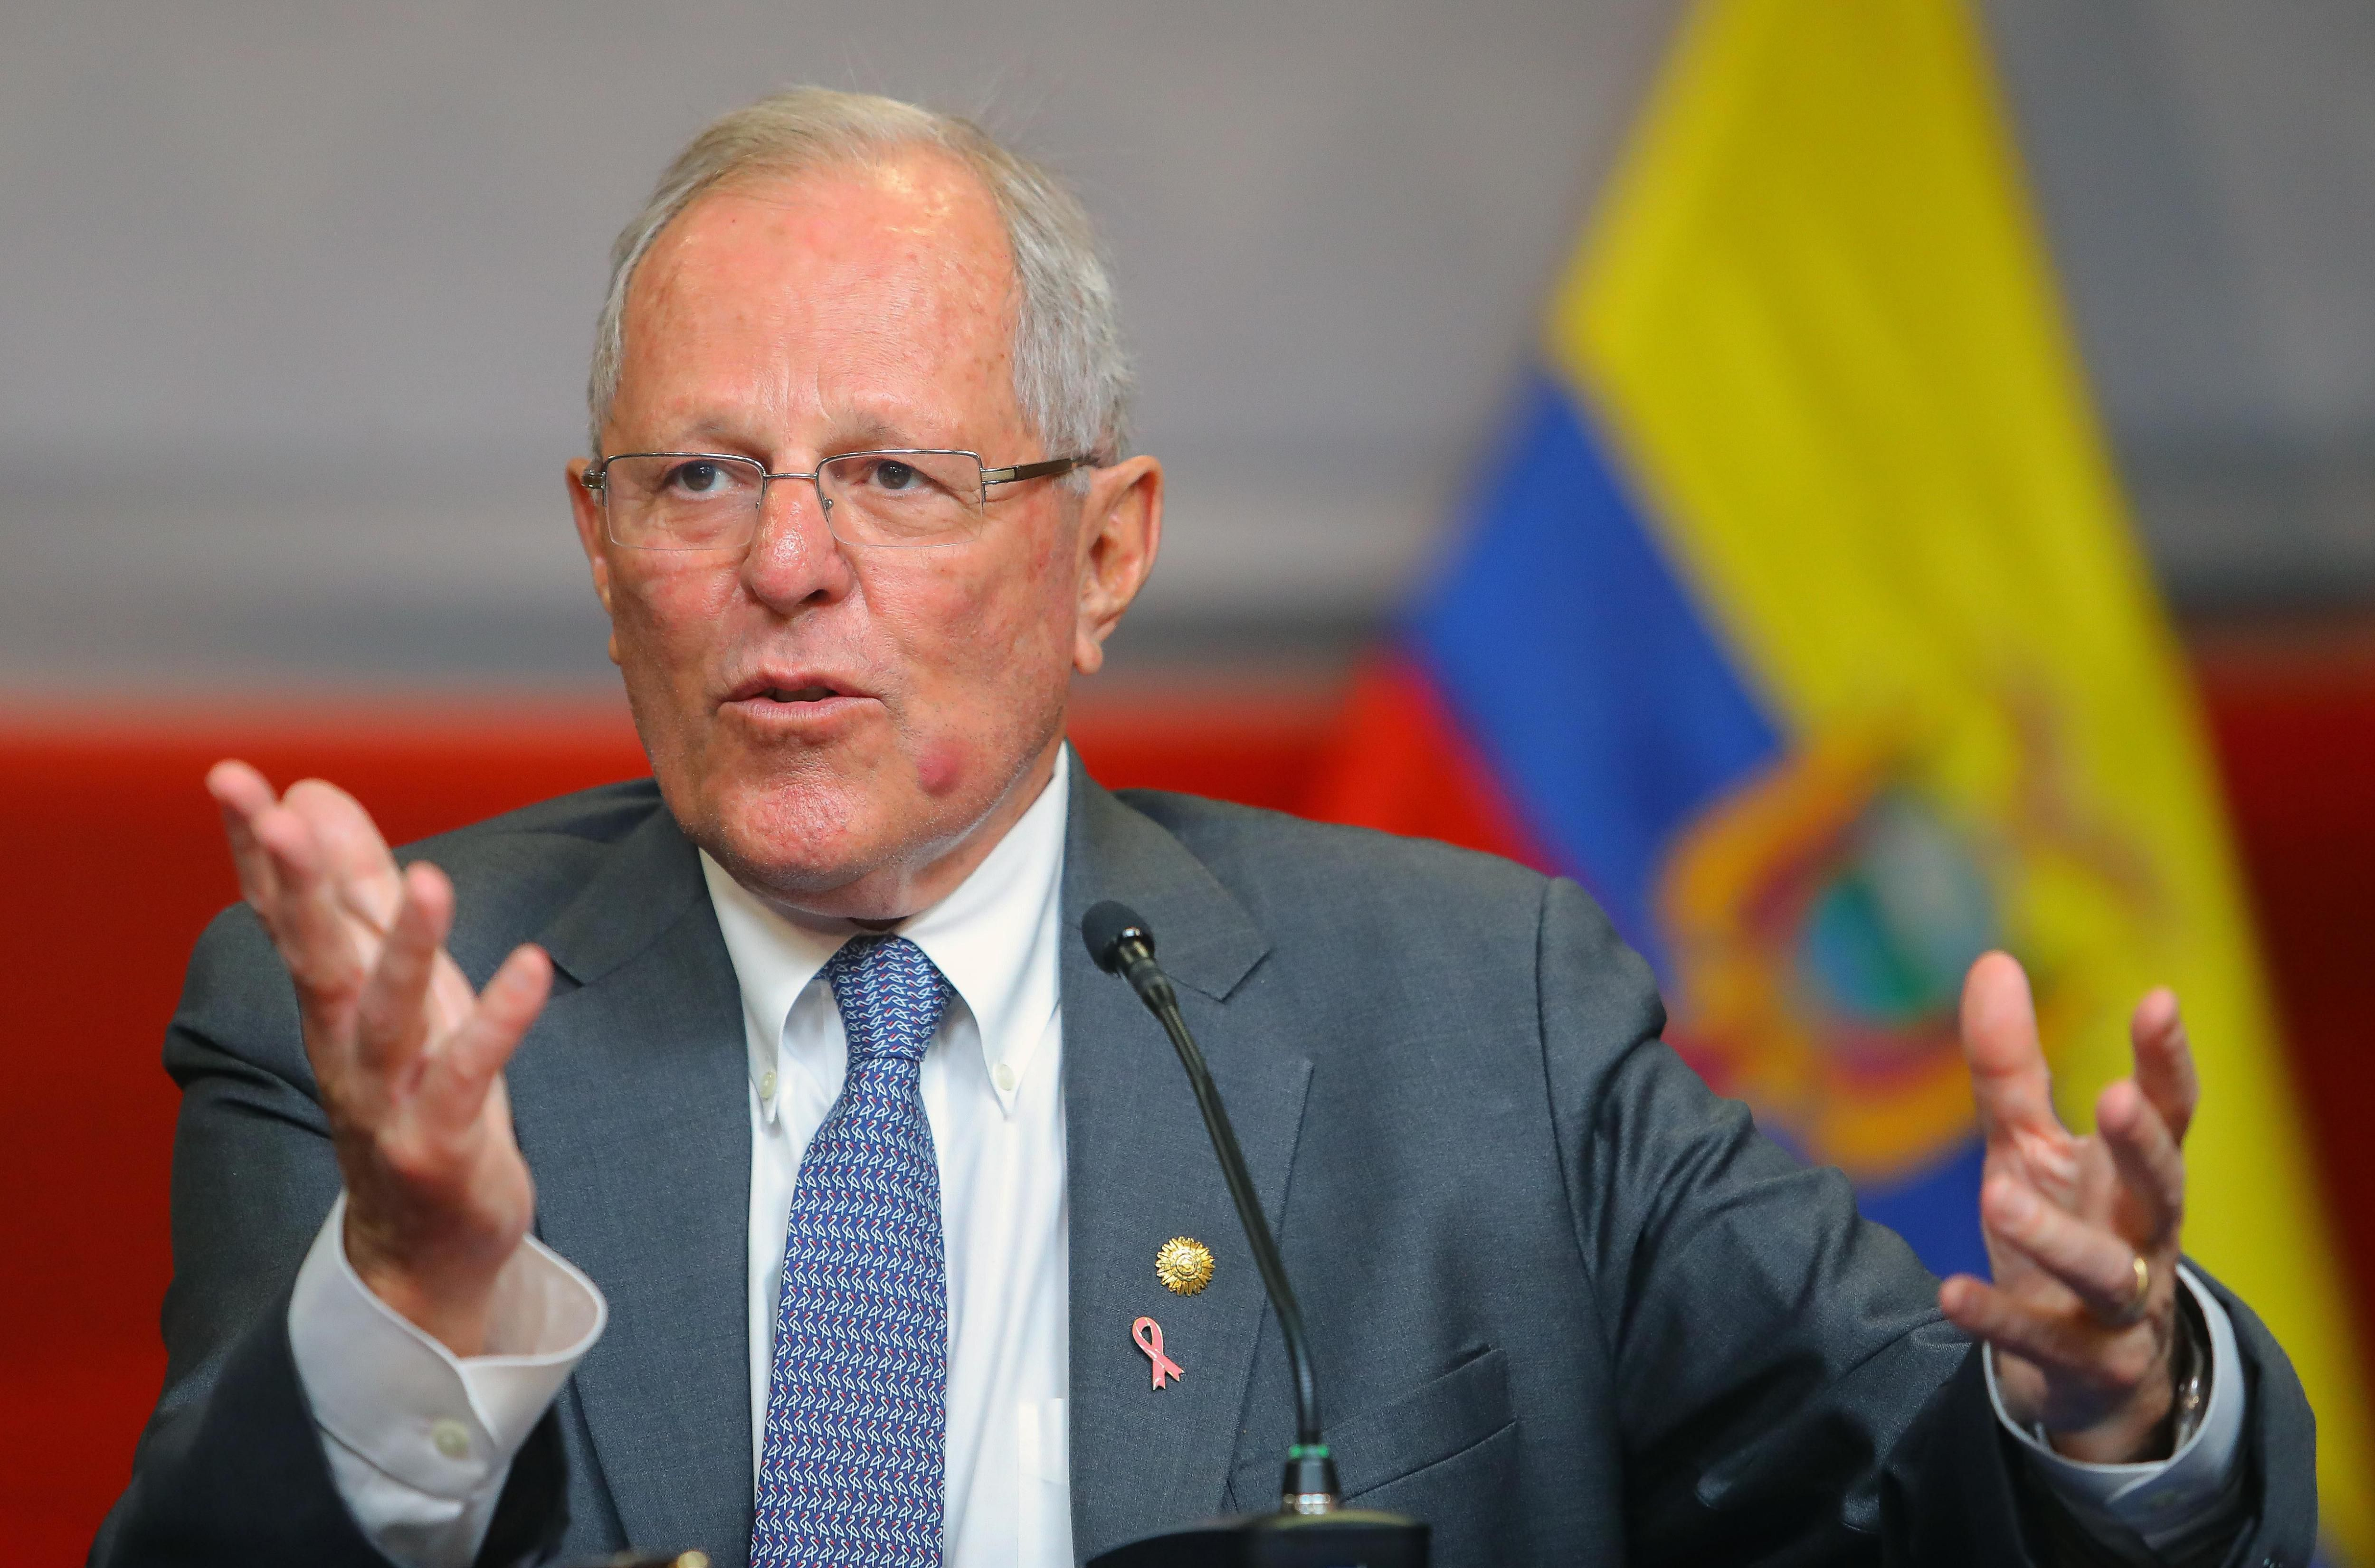 En la imagen, el expresidente peruano Pedro Pablo Kuczynski. EFE/Stringer